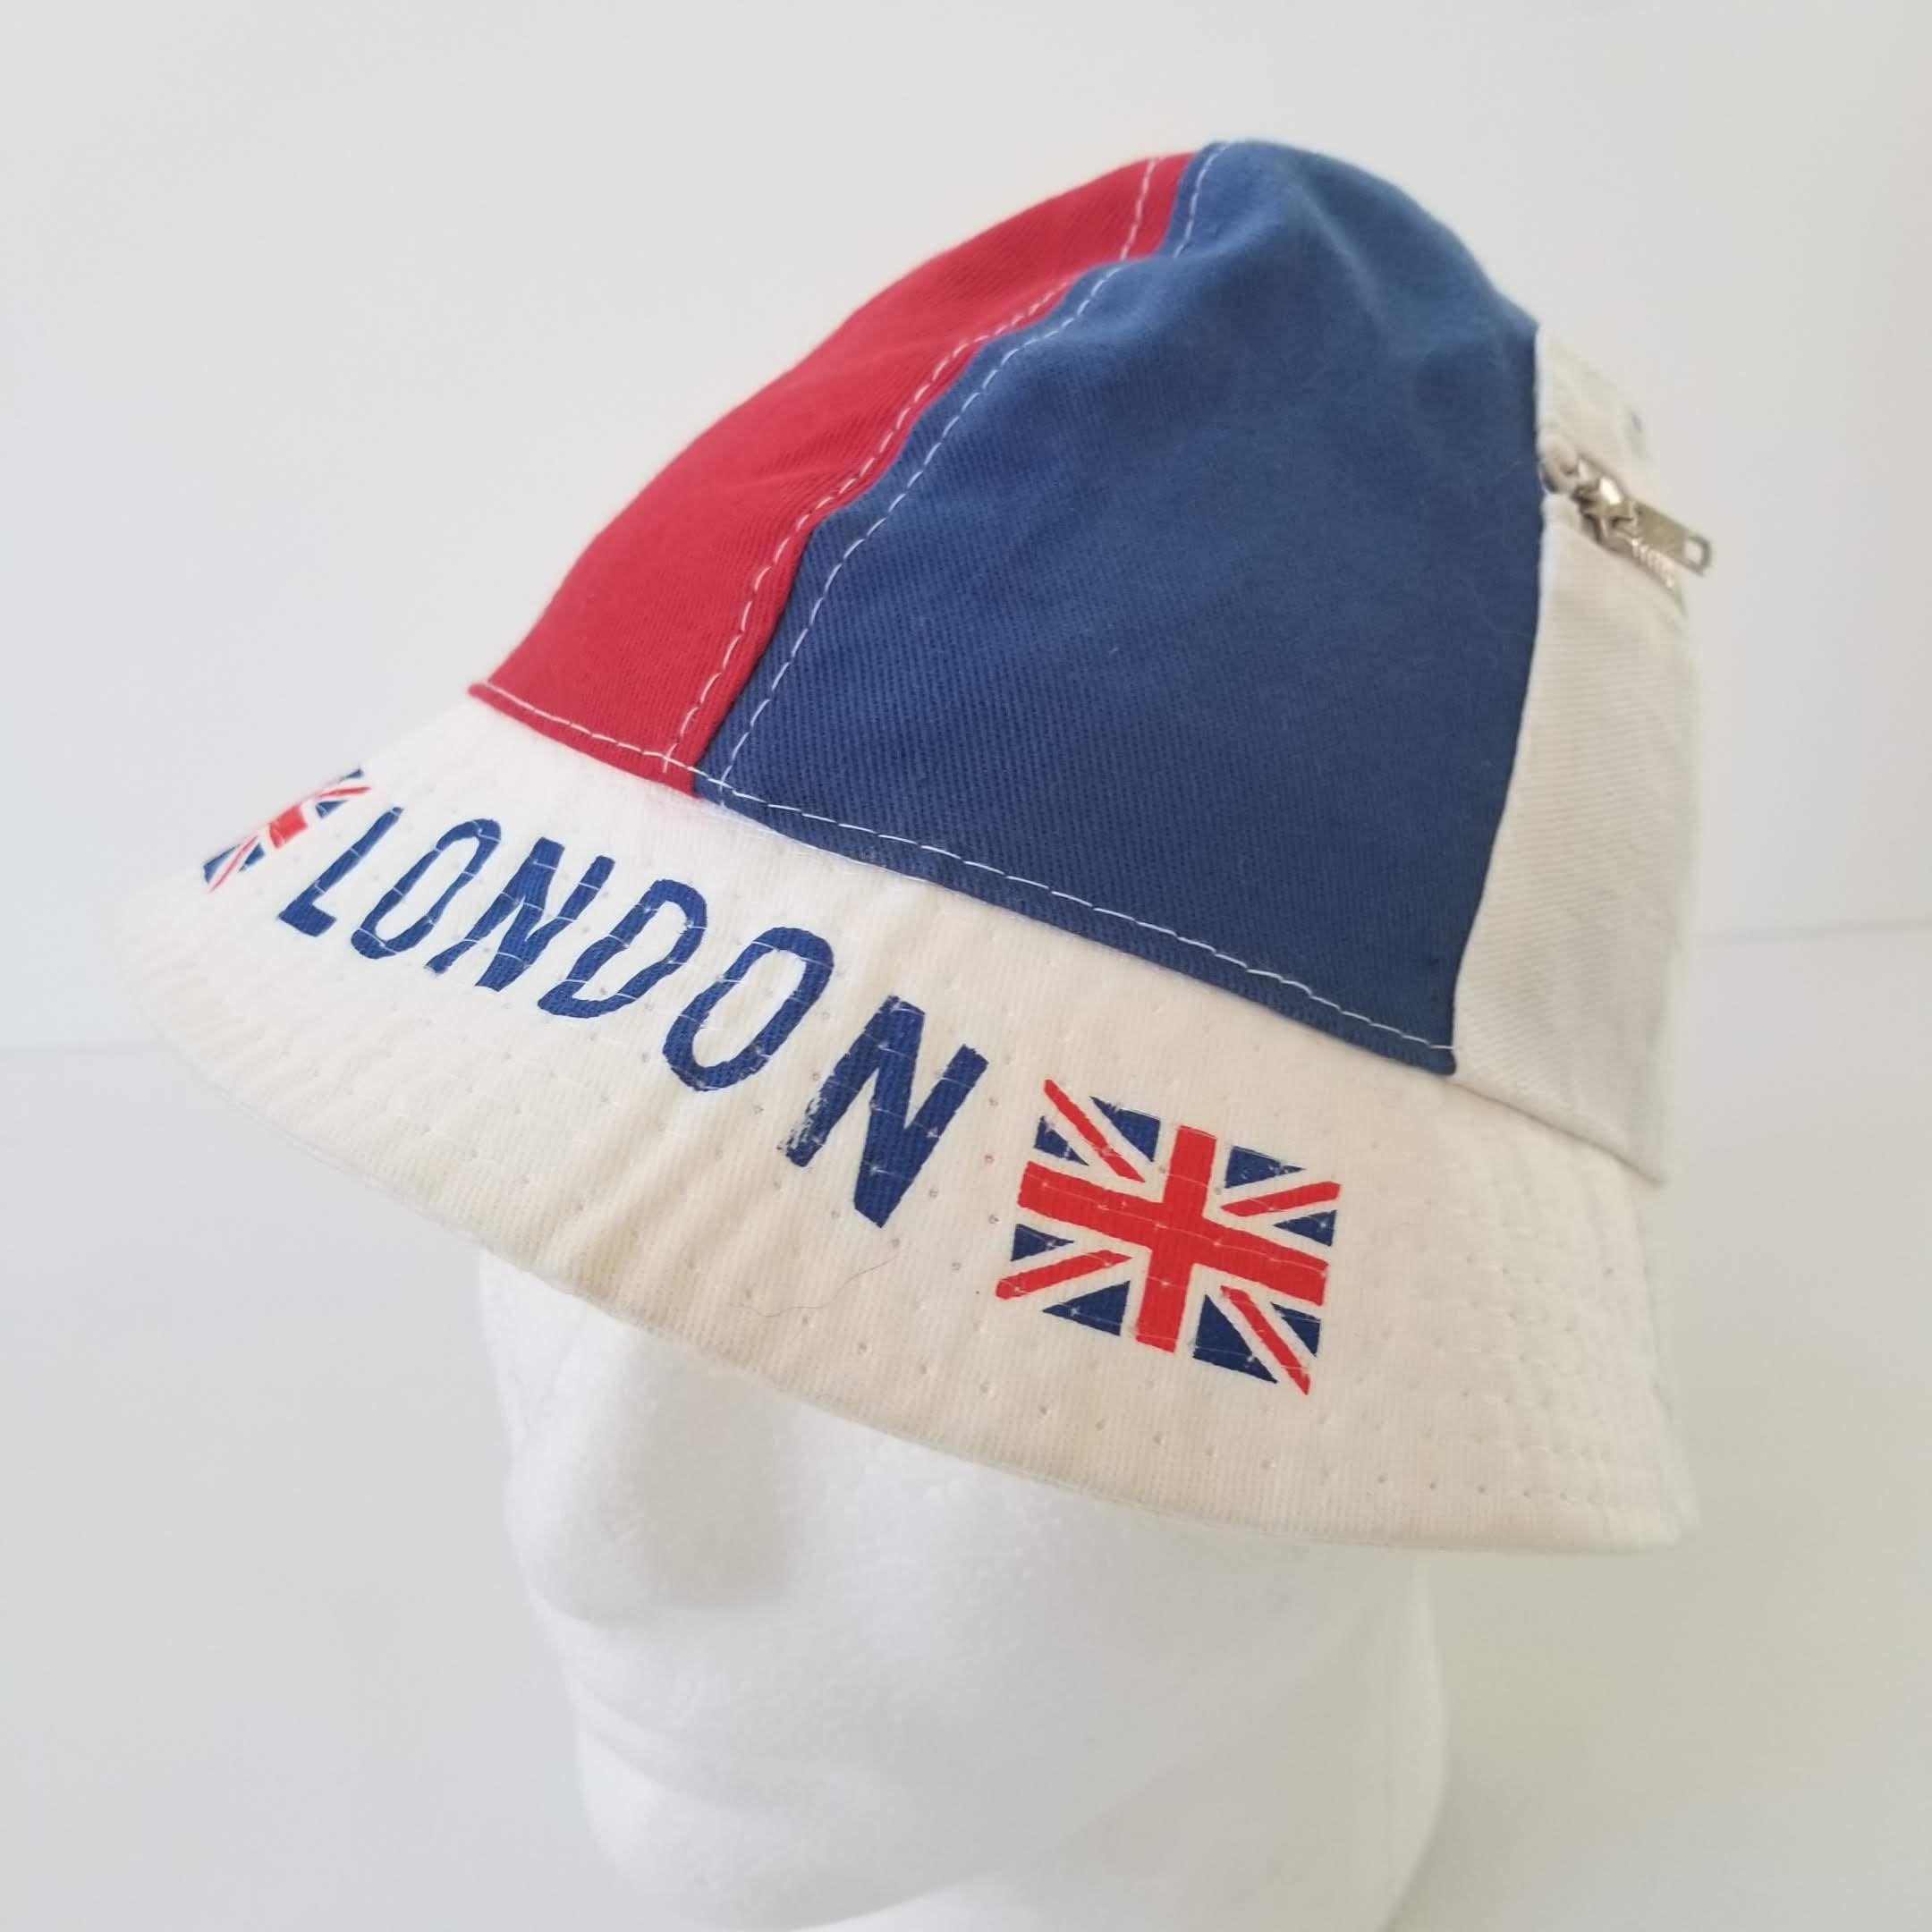 318363e22d0 Vintage London England Bucket Hat Adult M Child L Pockets Union Jack White  Blue Red Flag by TraSheeWomen on Etsy  london  england  britain  uk   vintage ...